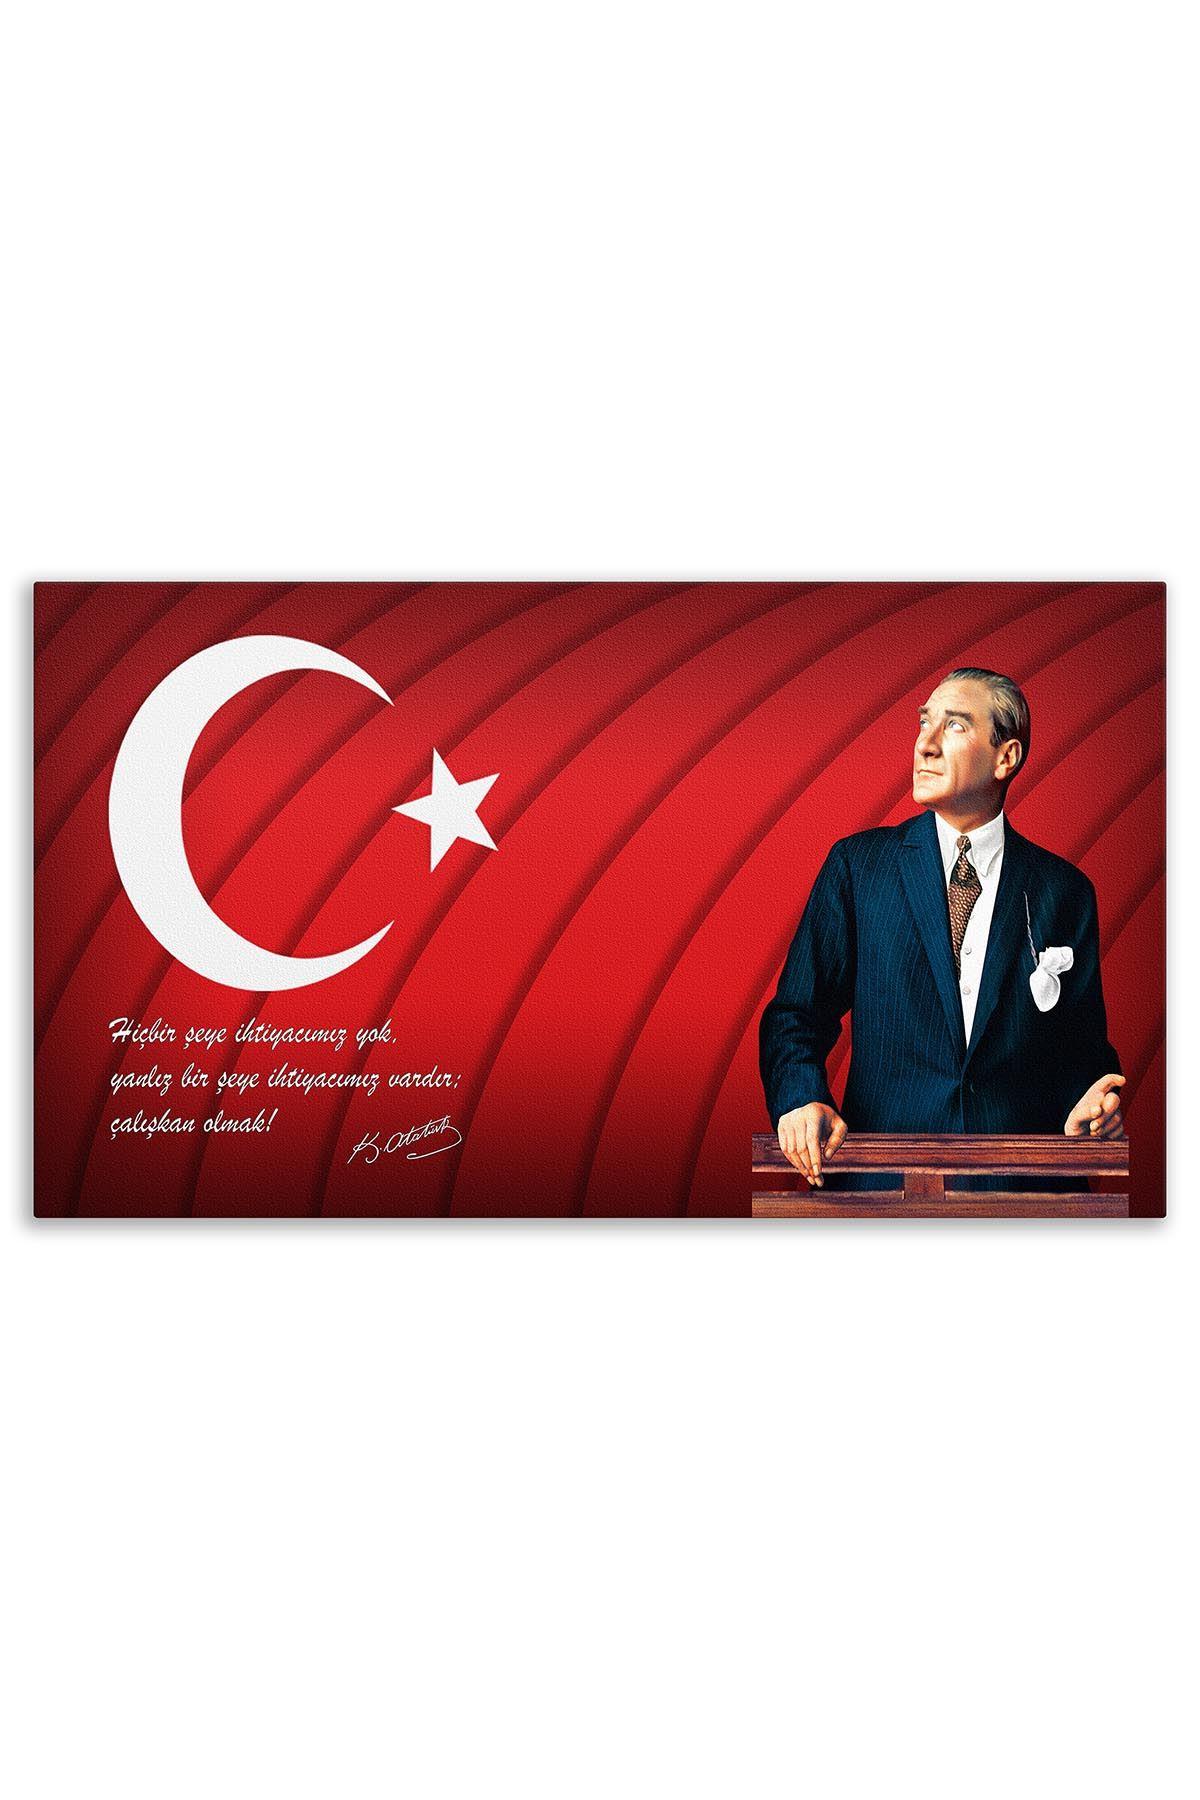 Atatürk Canvas Board | Printed Canvas Board | Customized Canvas Board | Digital Printing